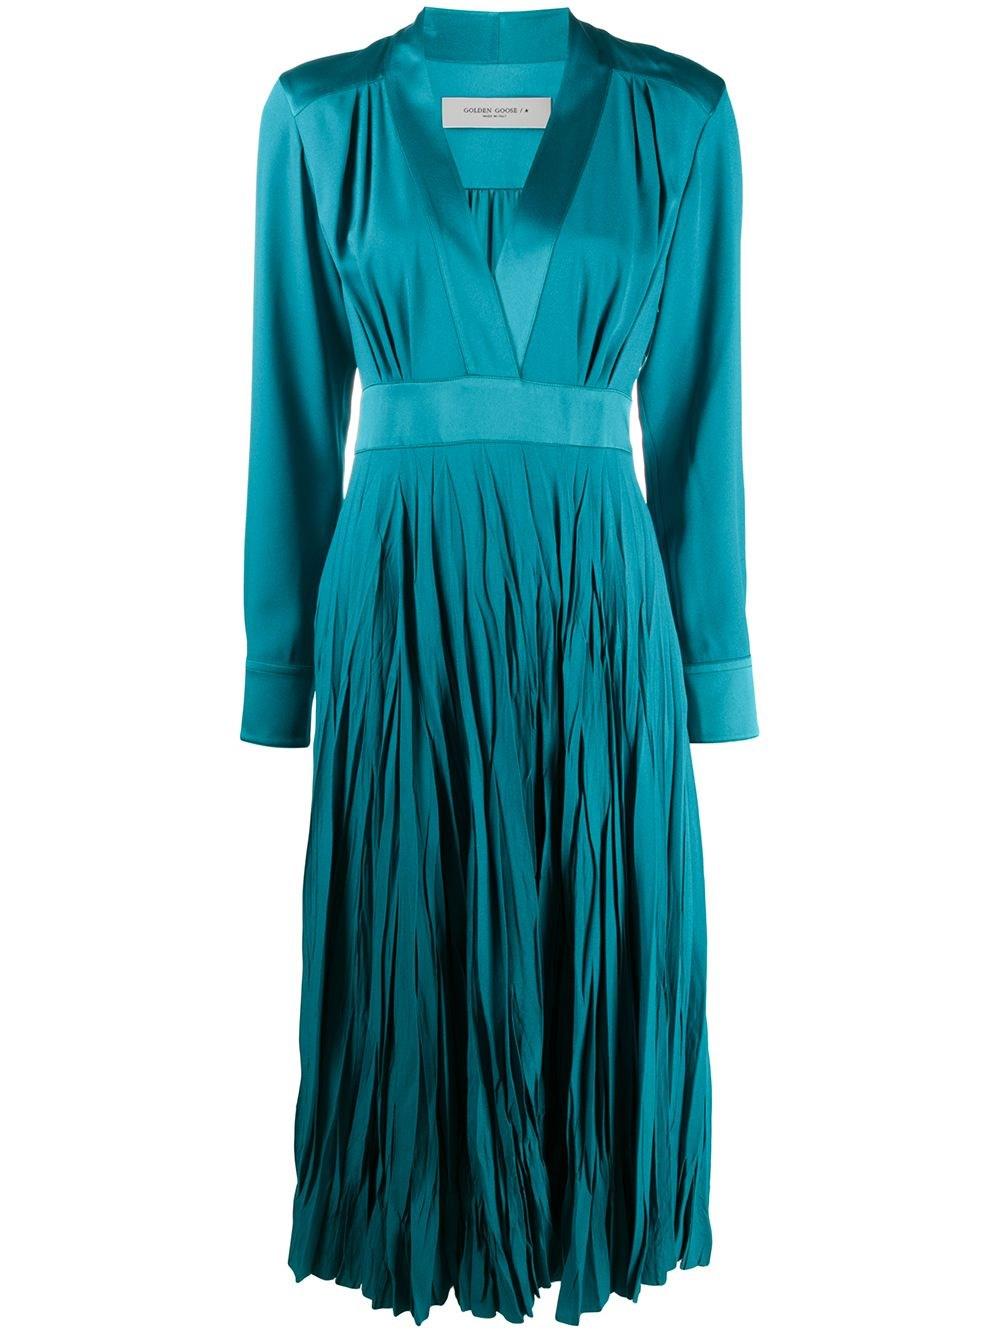 "GOLDEN GOOSE DELUXE BRAND ""Adriana"" Teal Blue Jersey Dress"